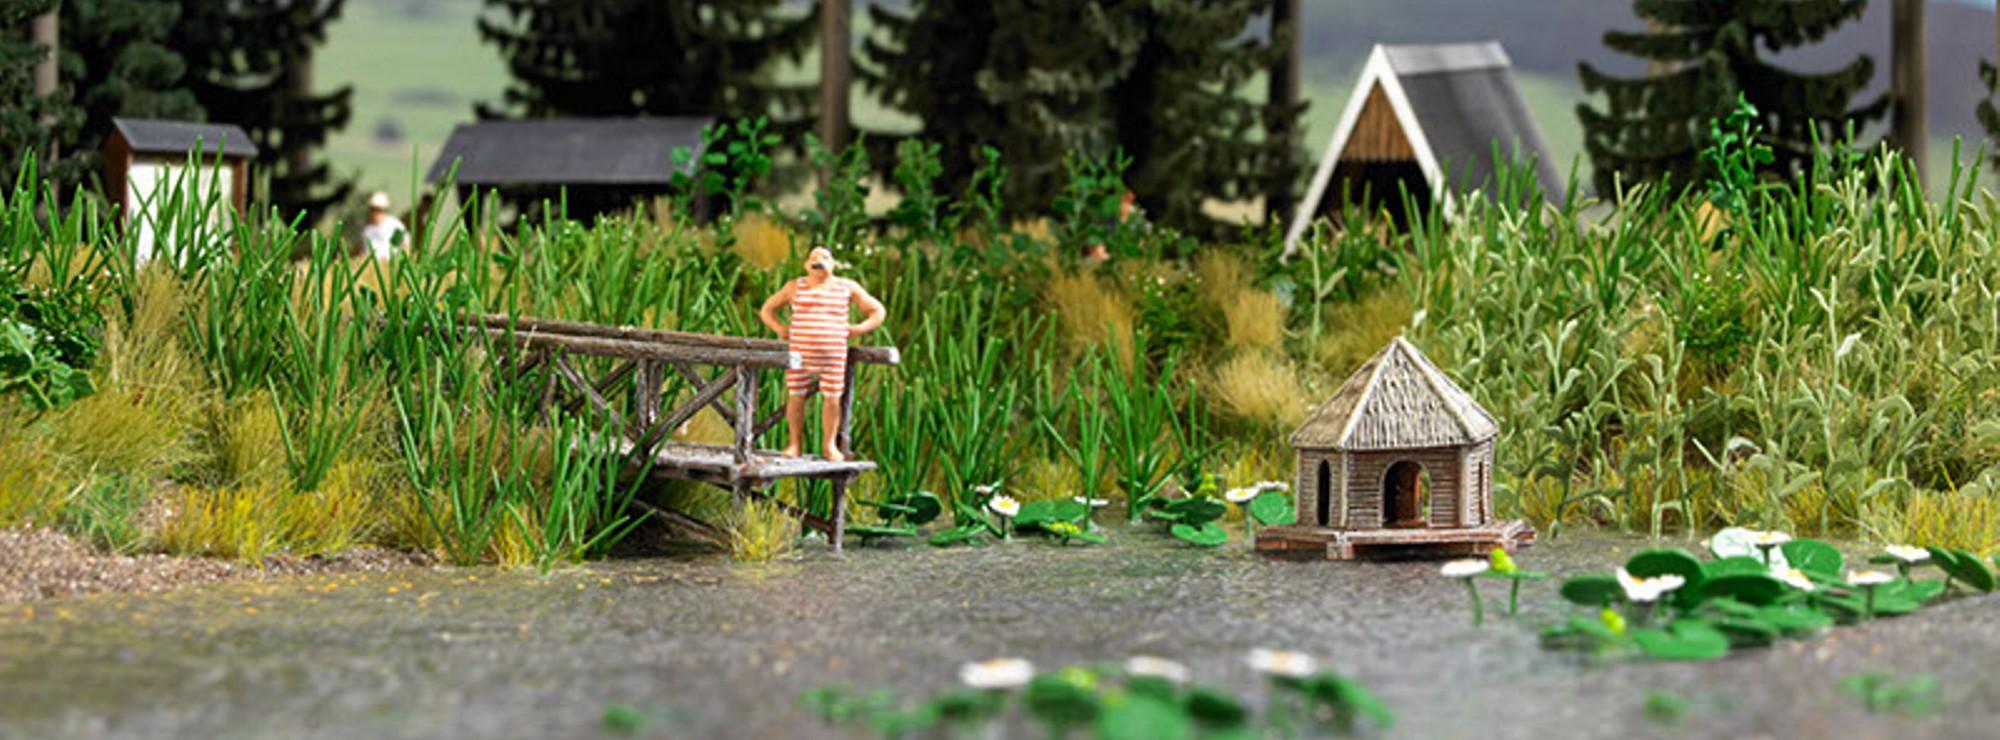 Landschaftsgestaltung  Garten Landschaft Gestaltung Wald – menerima.info